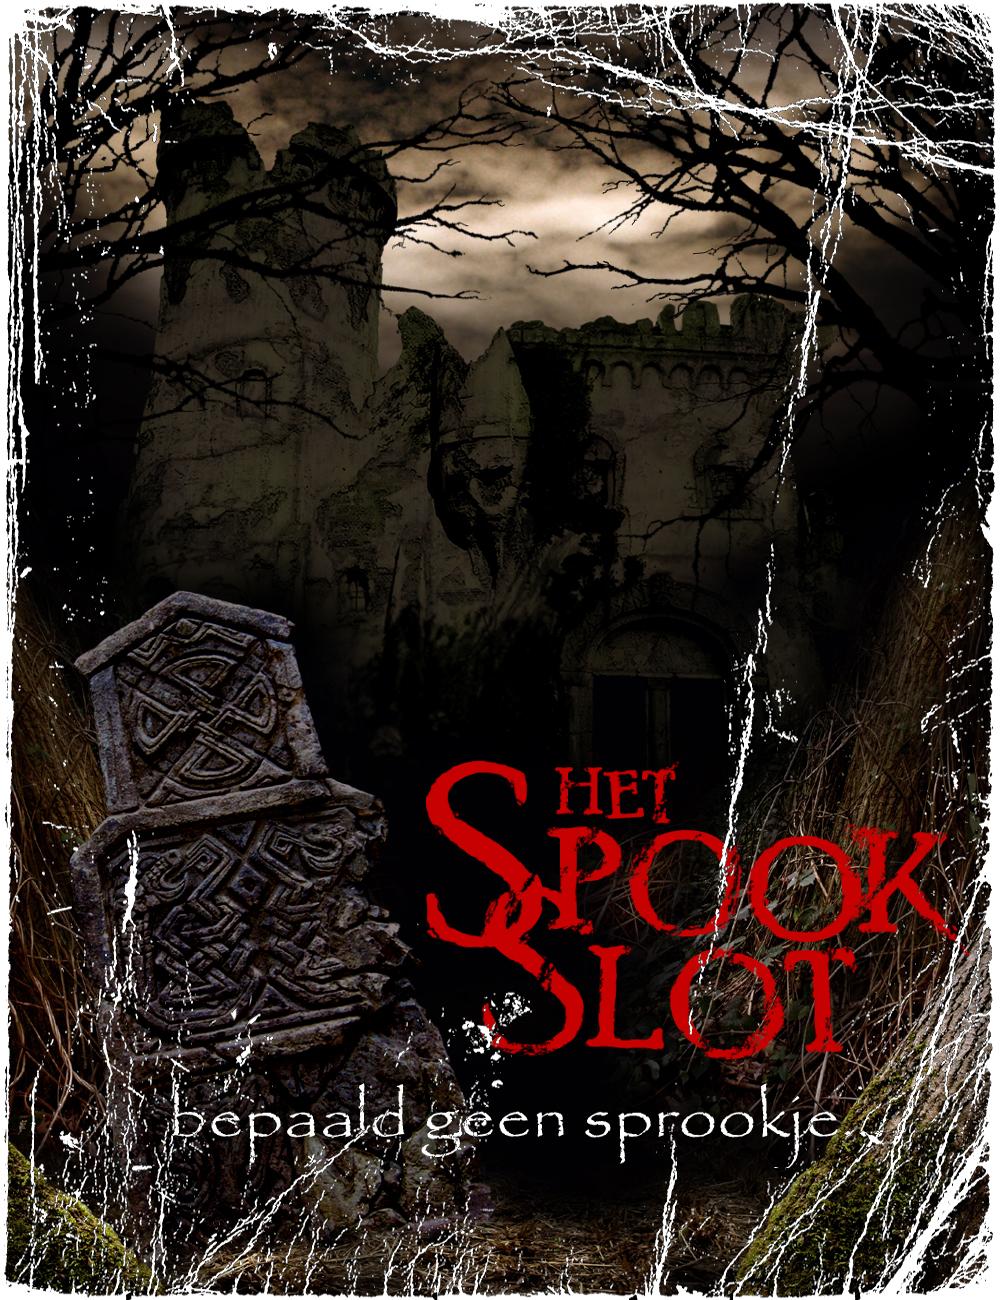 Spookslot